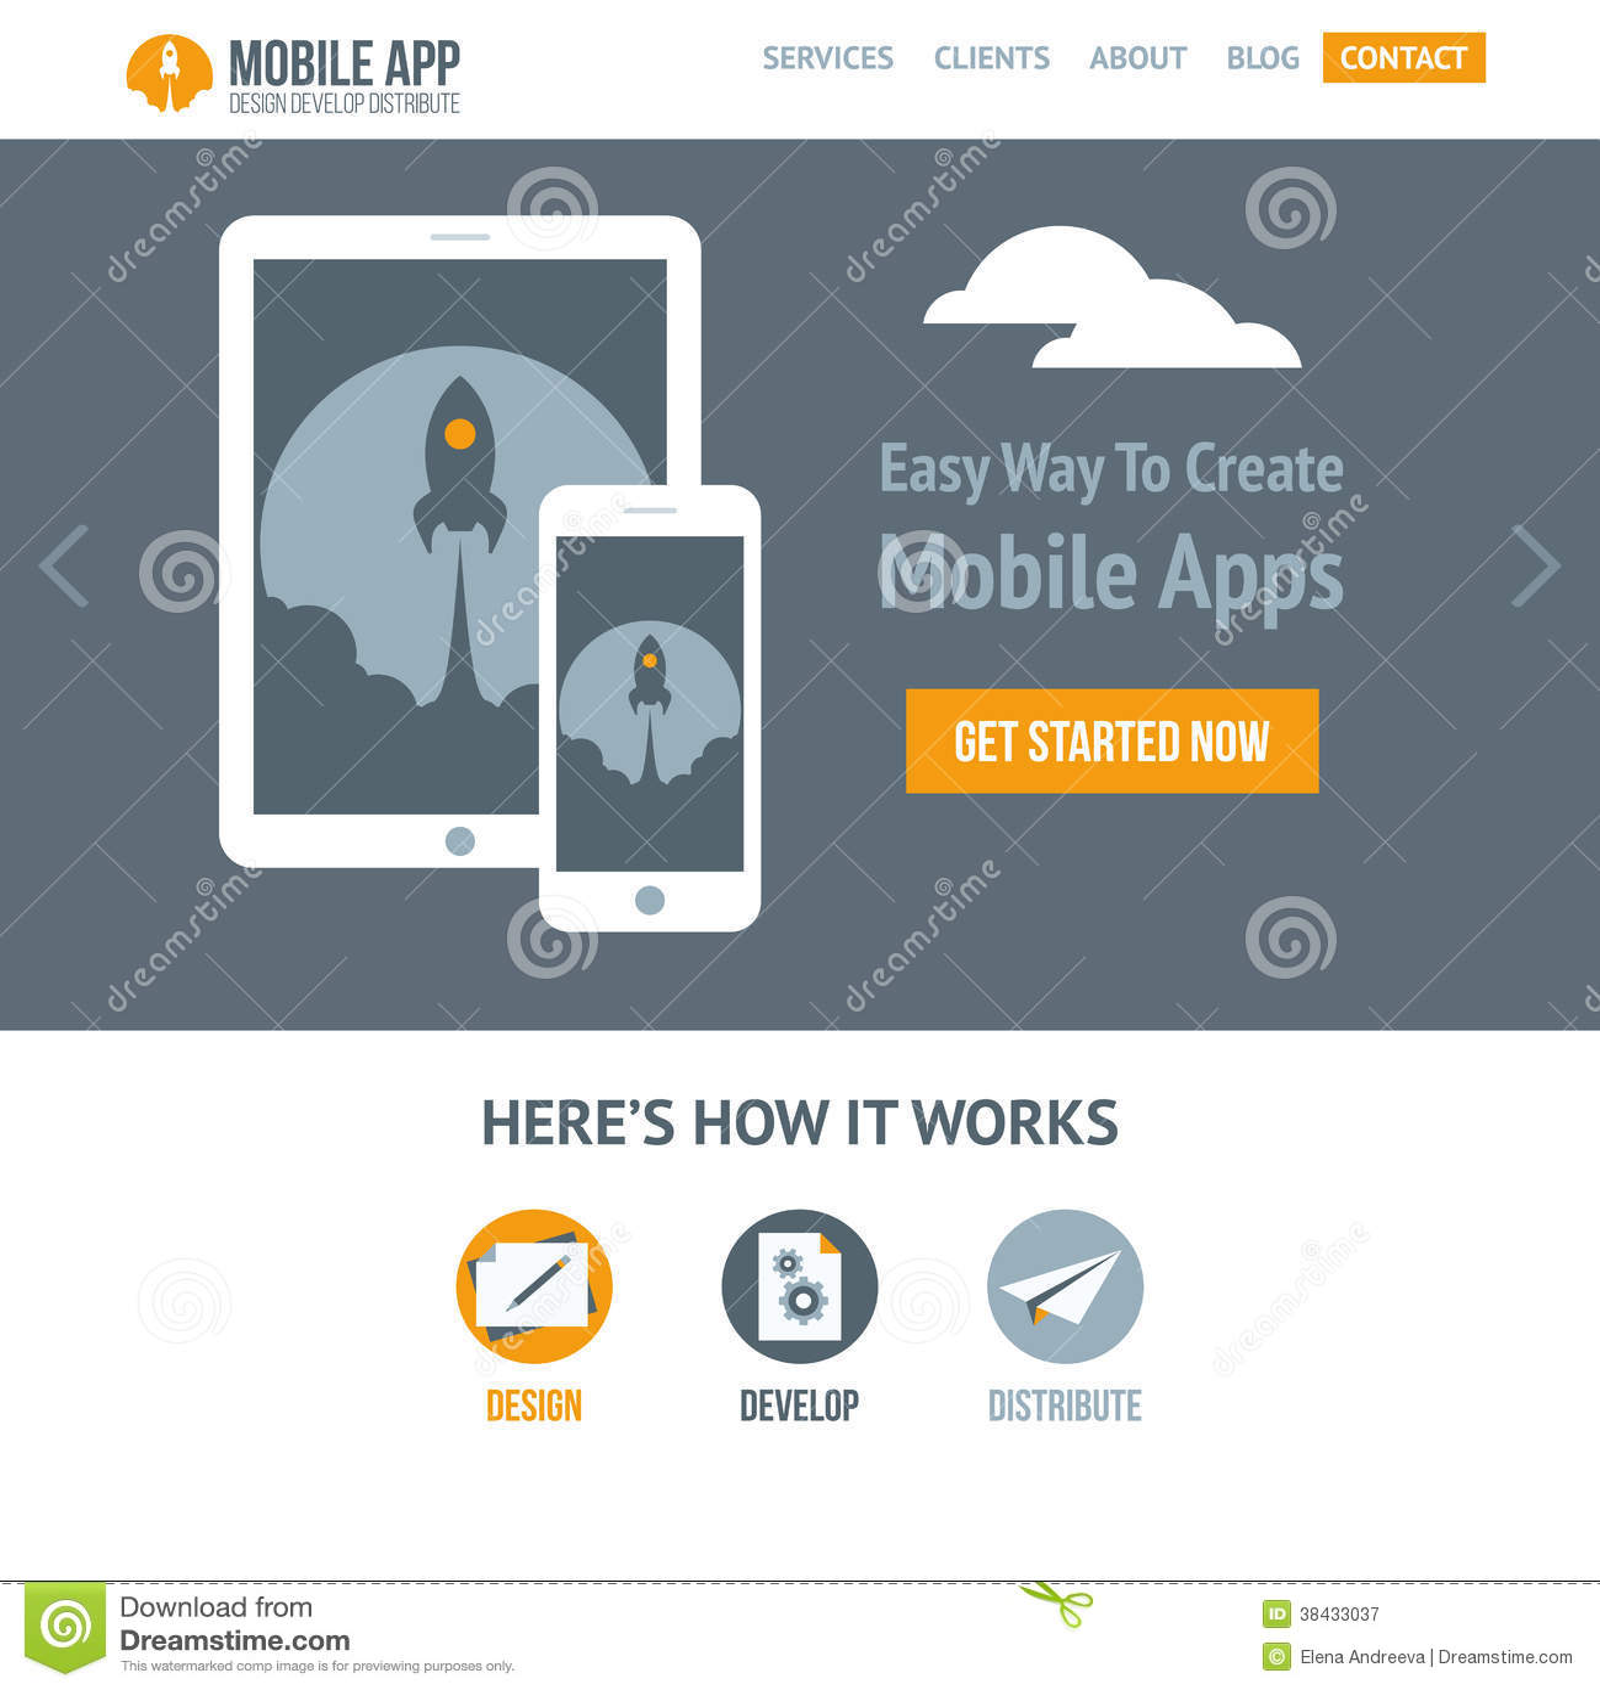 trendy flat vector website template for company creating mobile trendy flat vector website template for company creating mobile apps